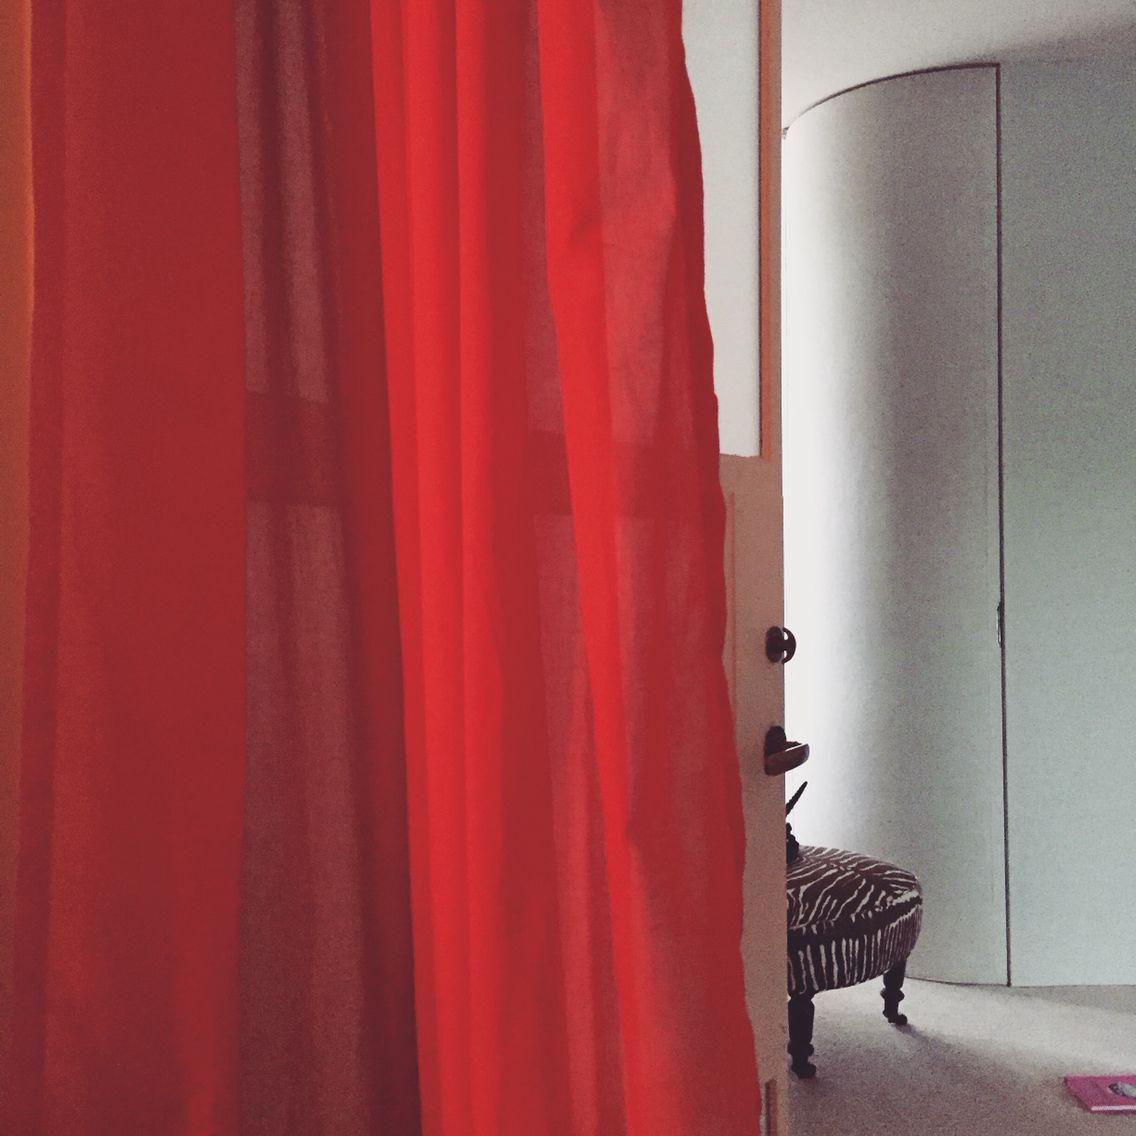 Red curtains zebra chair decor interior design